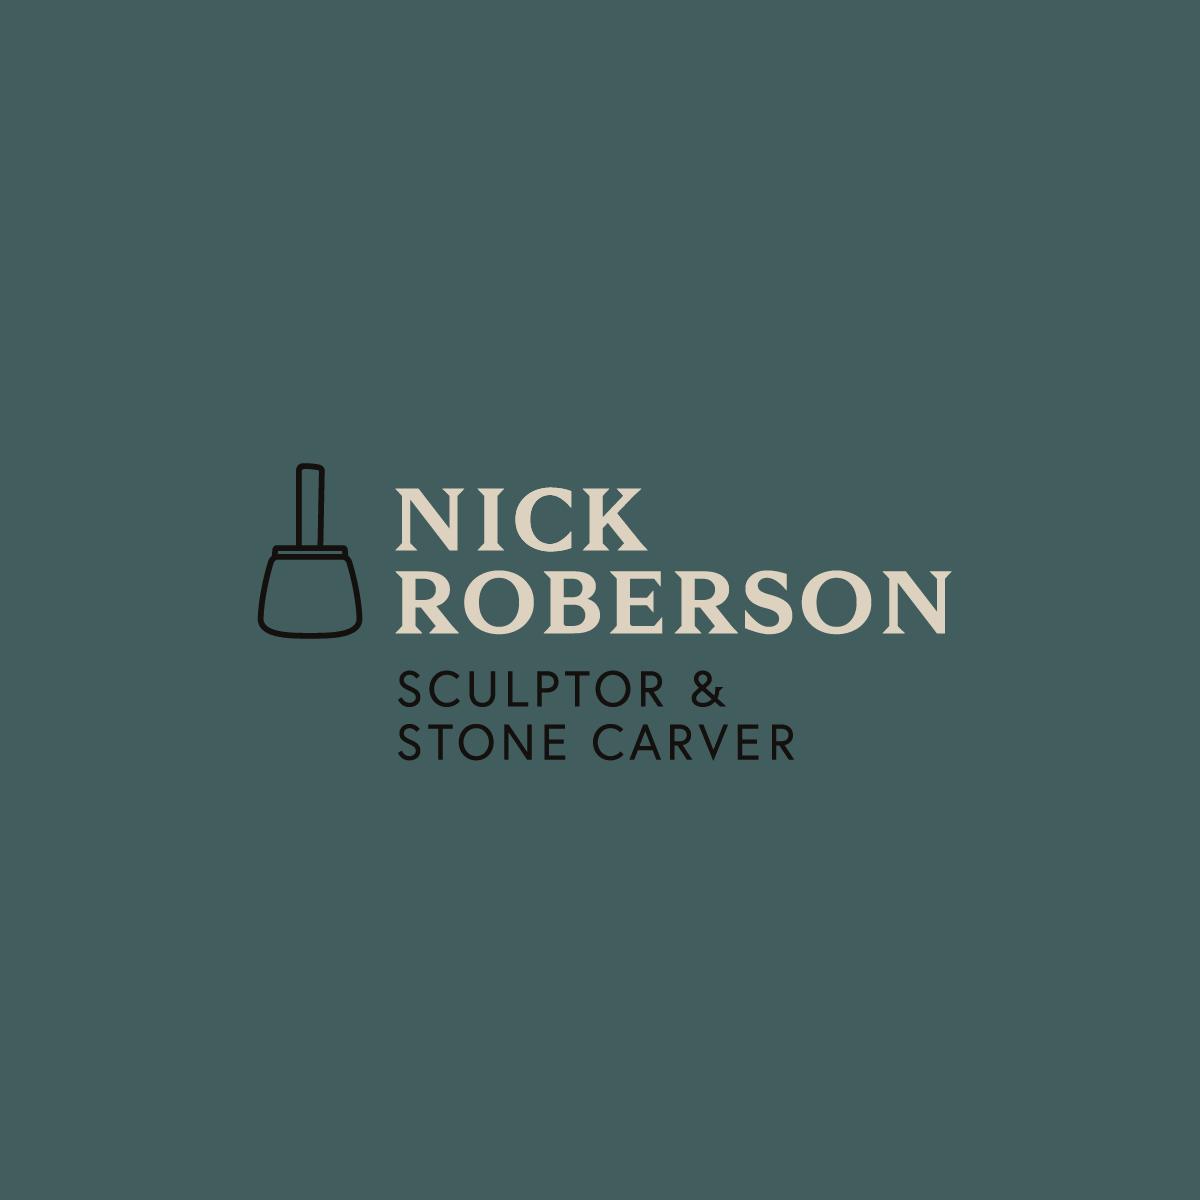 Nick-Roberson-Branding_Logo